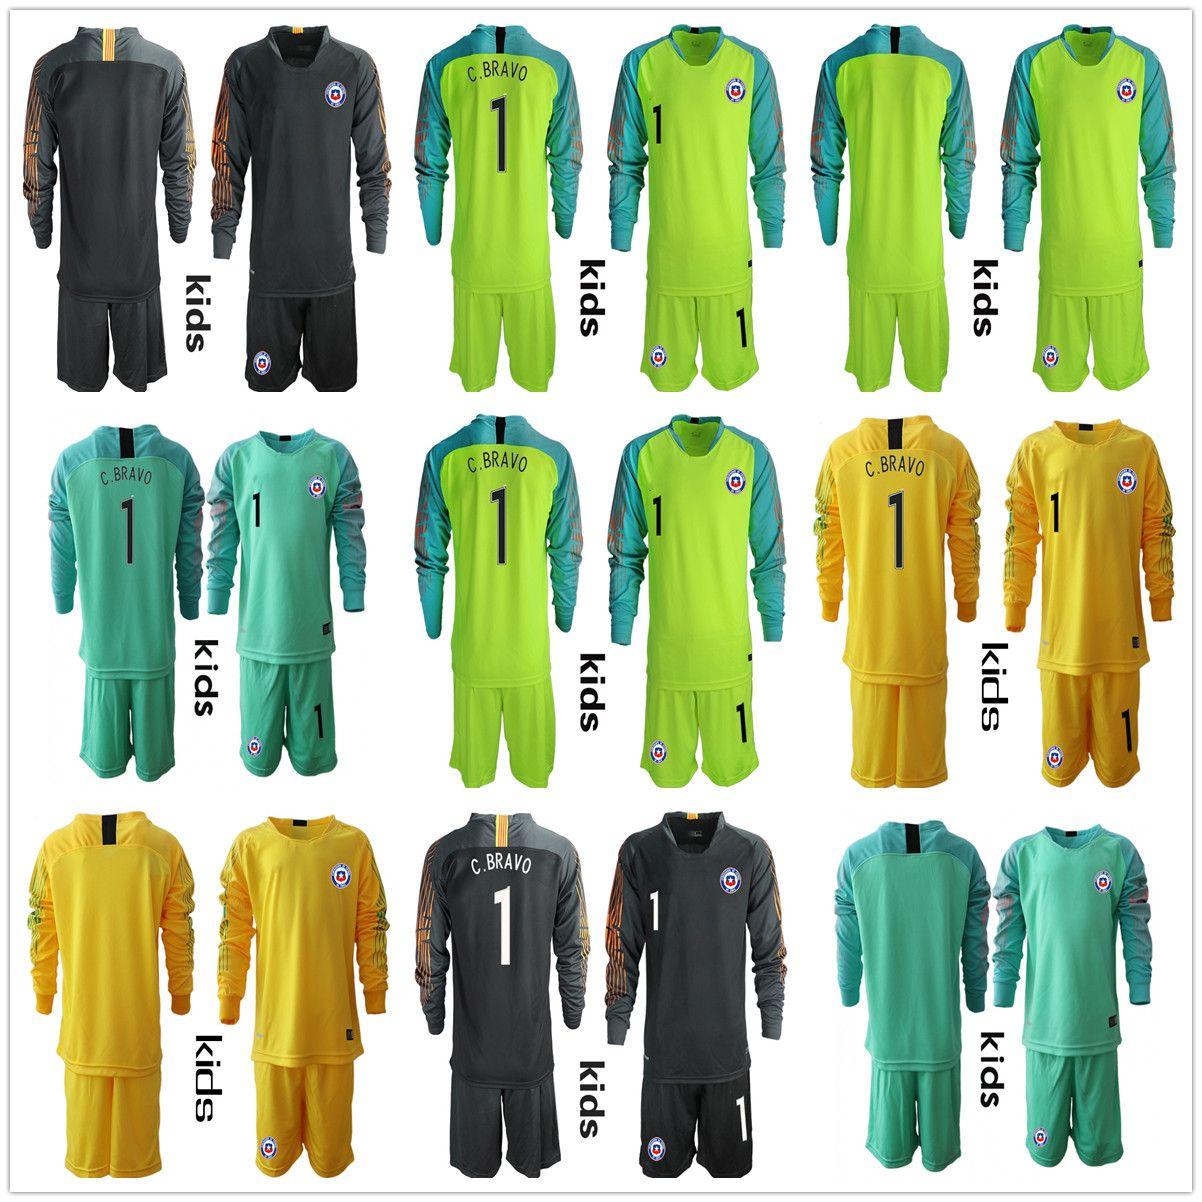 4718ca19478 2019 Long Sleeve Youth 2018 2019 Kids Boys Soccer Jerseys  1 C. BRAVO Chile Goalkeeper  National Team GK Jerseys Kid Football VALDIVIA Kid Uniform From ...